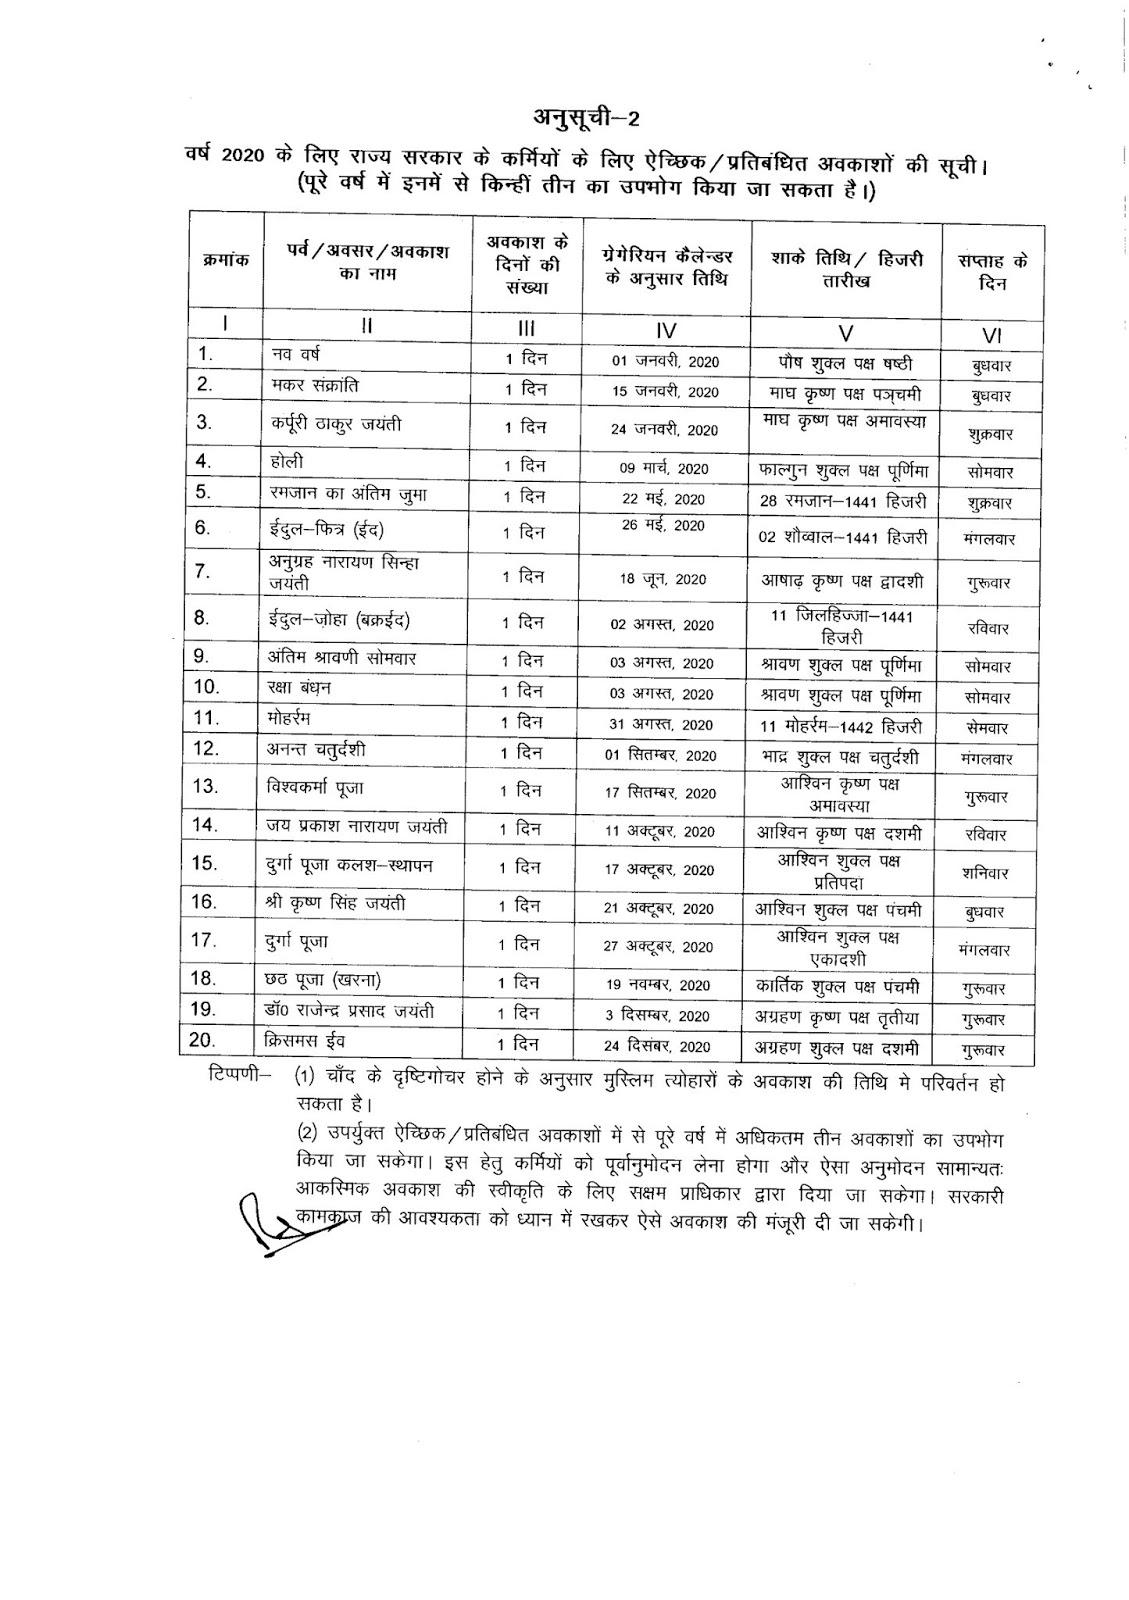 Bihar Goverment Calender 2020 | Calendar For Planning within Bihar Govt Calendar 2018